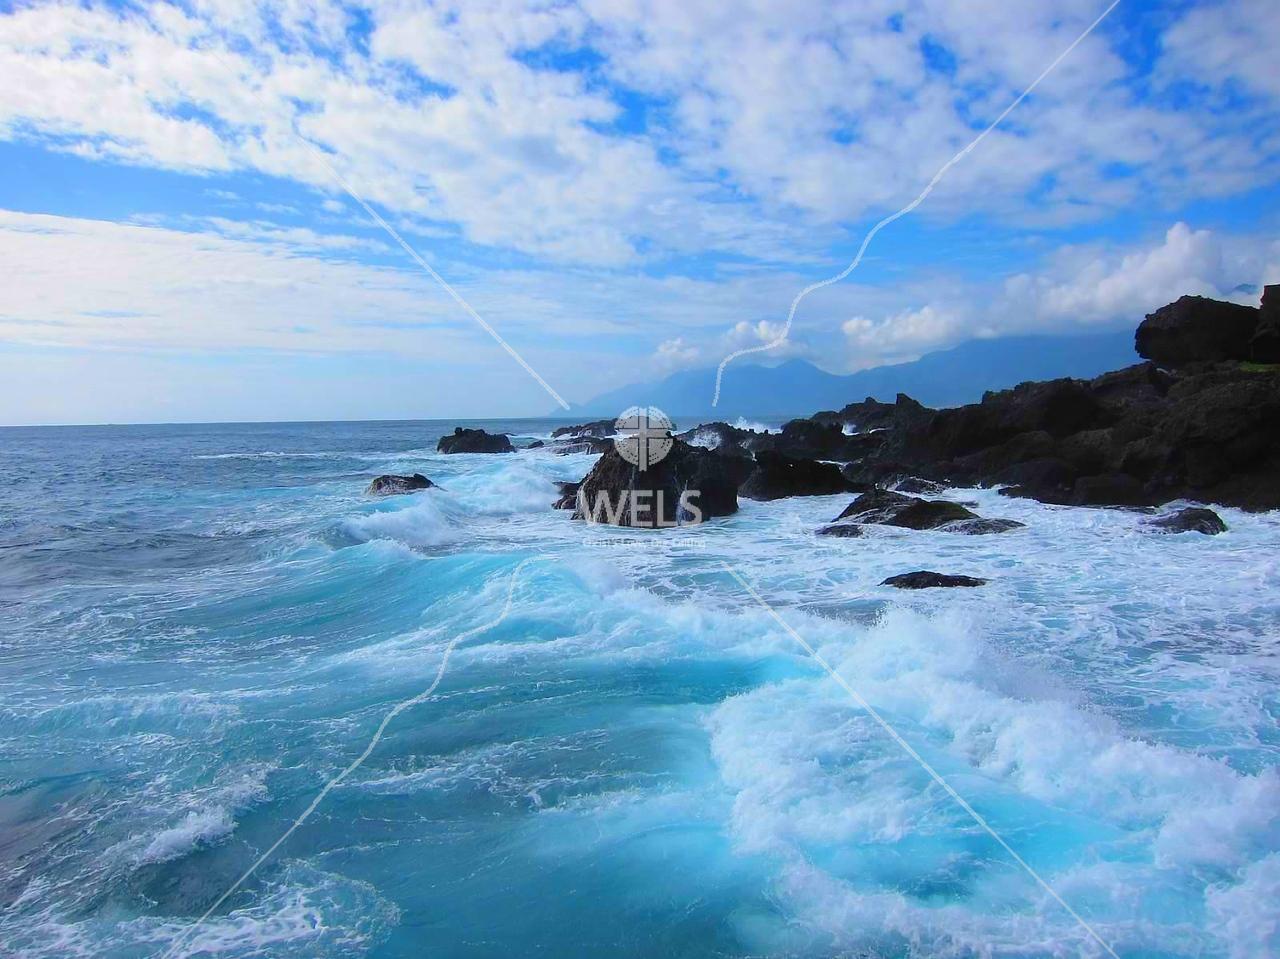 Foaming surf on east coast of Taiwan by kstellick